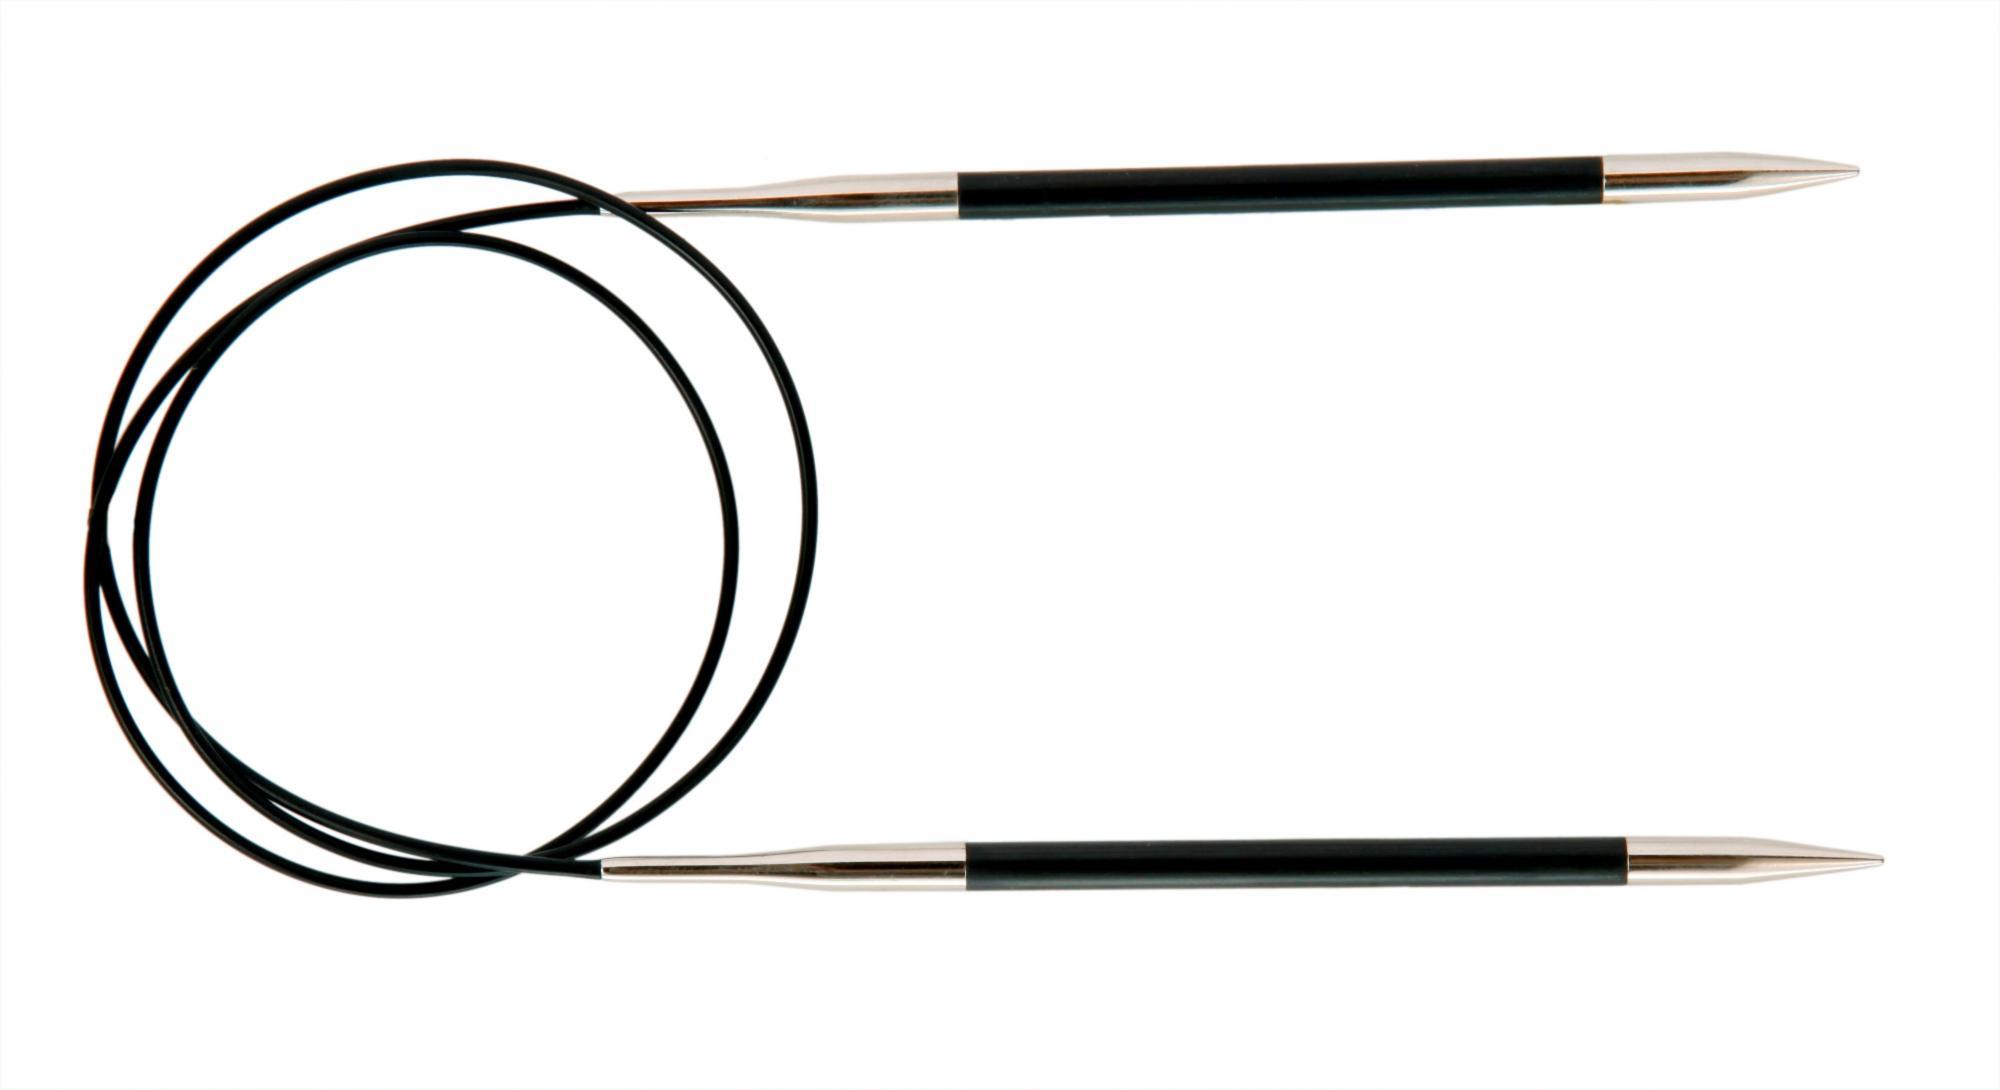 Спицы круговые 80 см Karbonz KnitPro, 41190, 5.00 мм